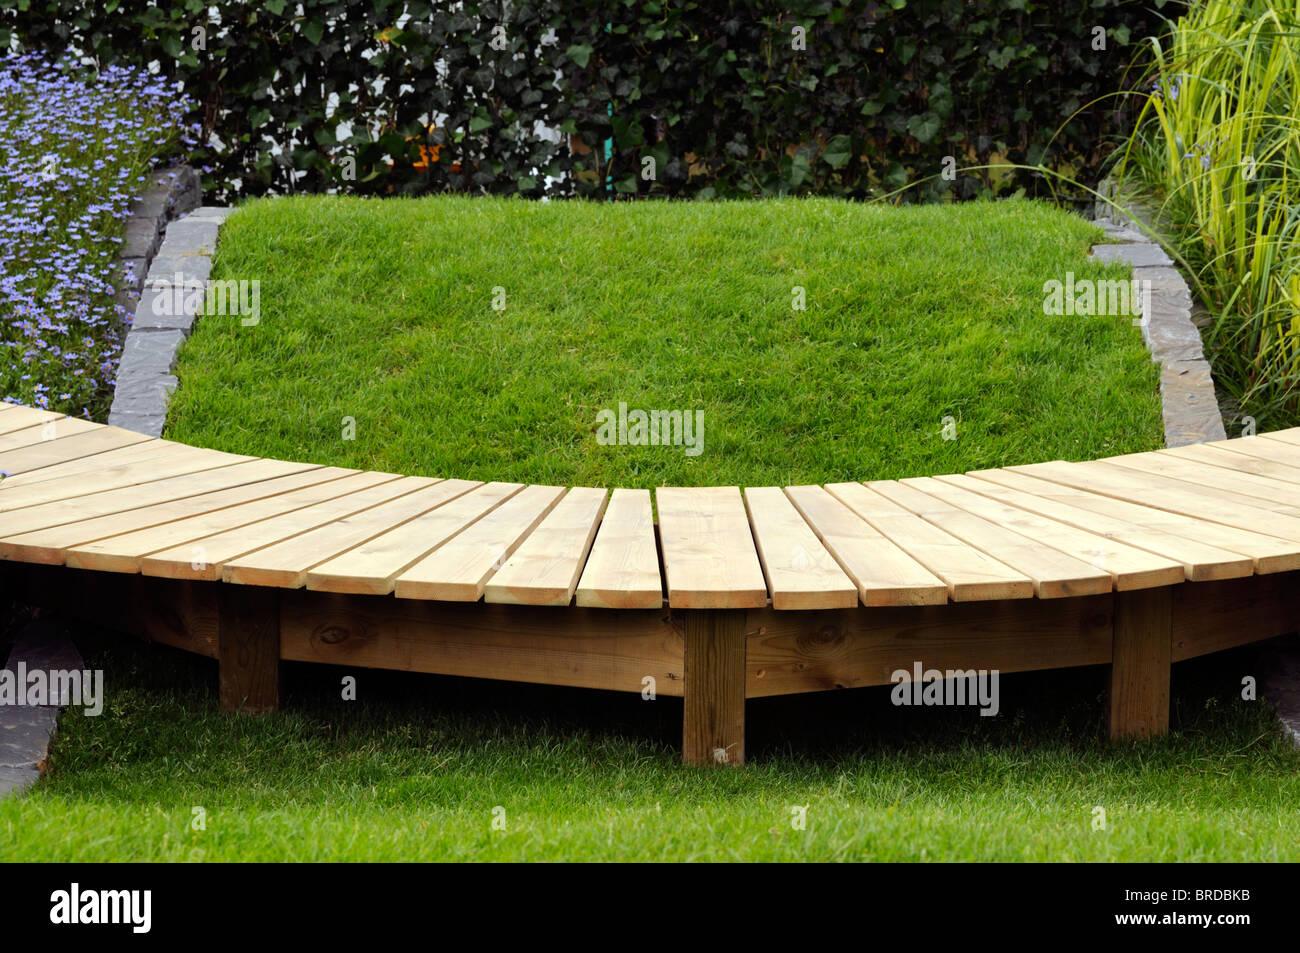 Stock Photo   Wooden Garden Decking Design Walk Walkway Path Pathway Raised  Decorative Ornamental Architectural Plank Planks Feature